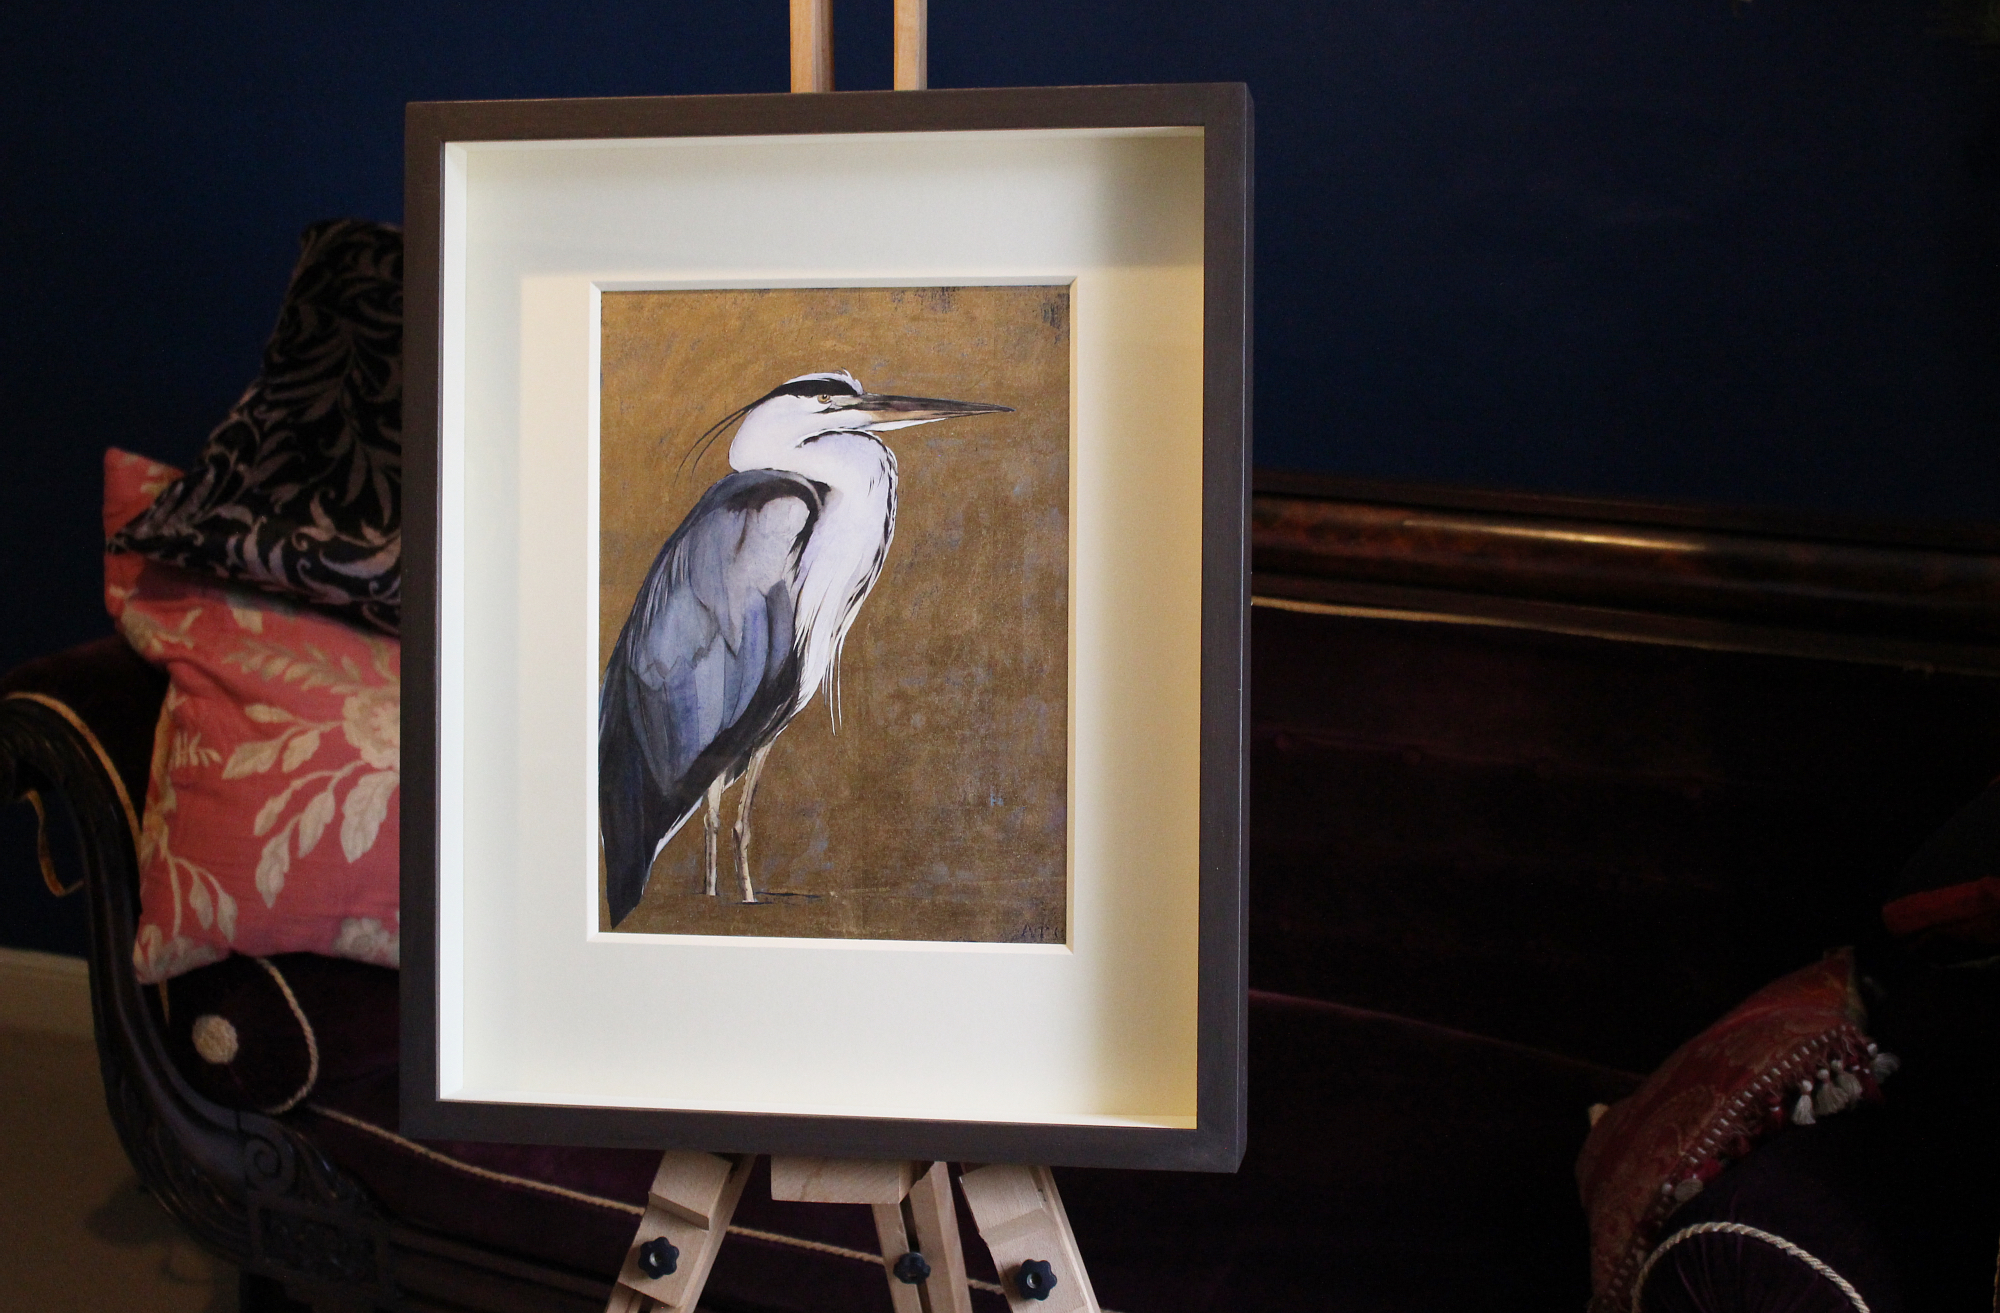 Heron | The Lost Words